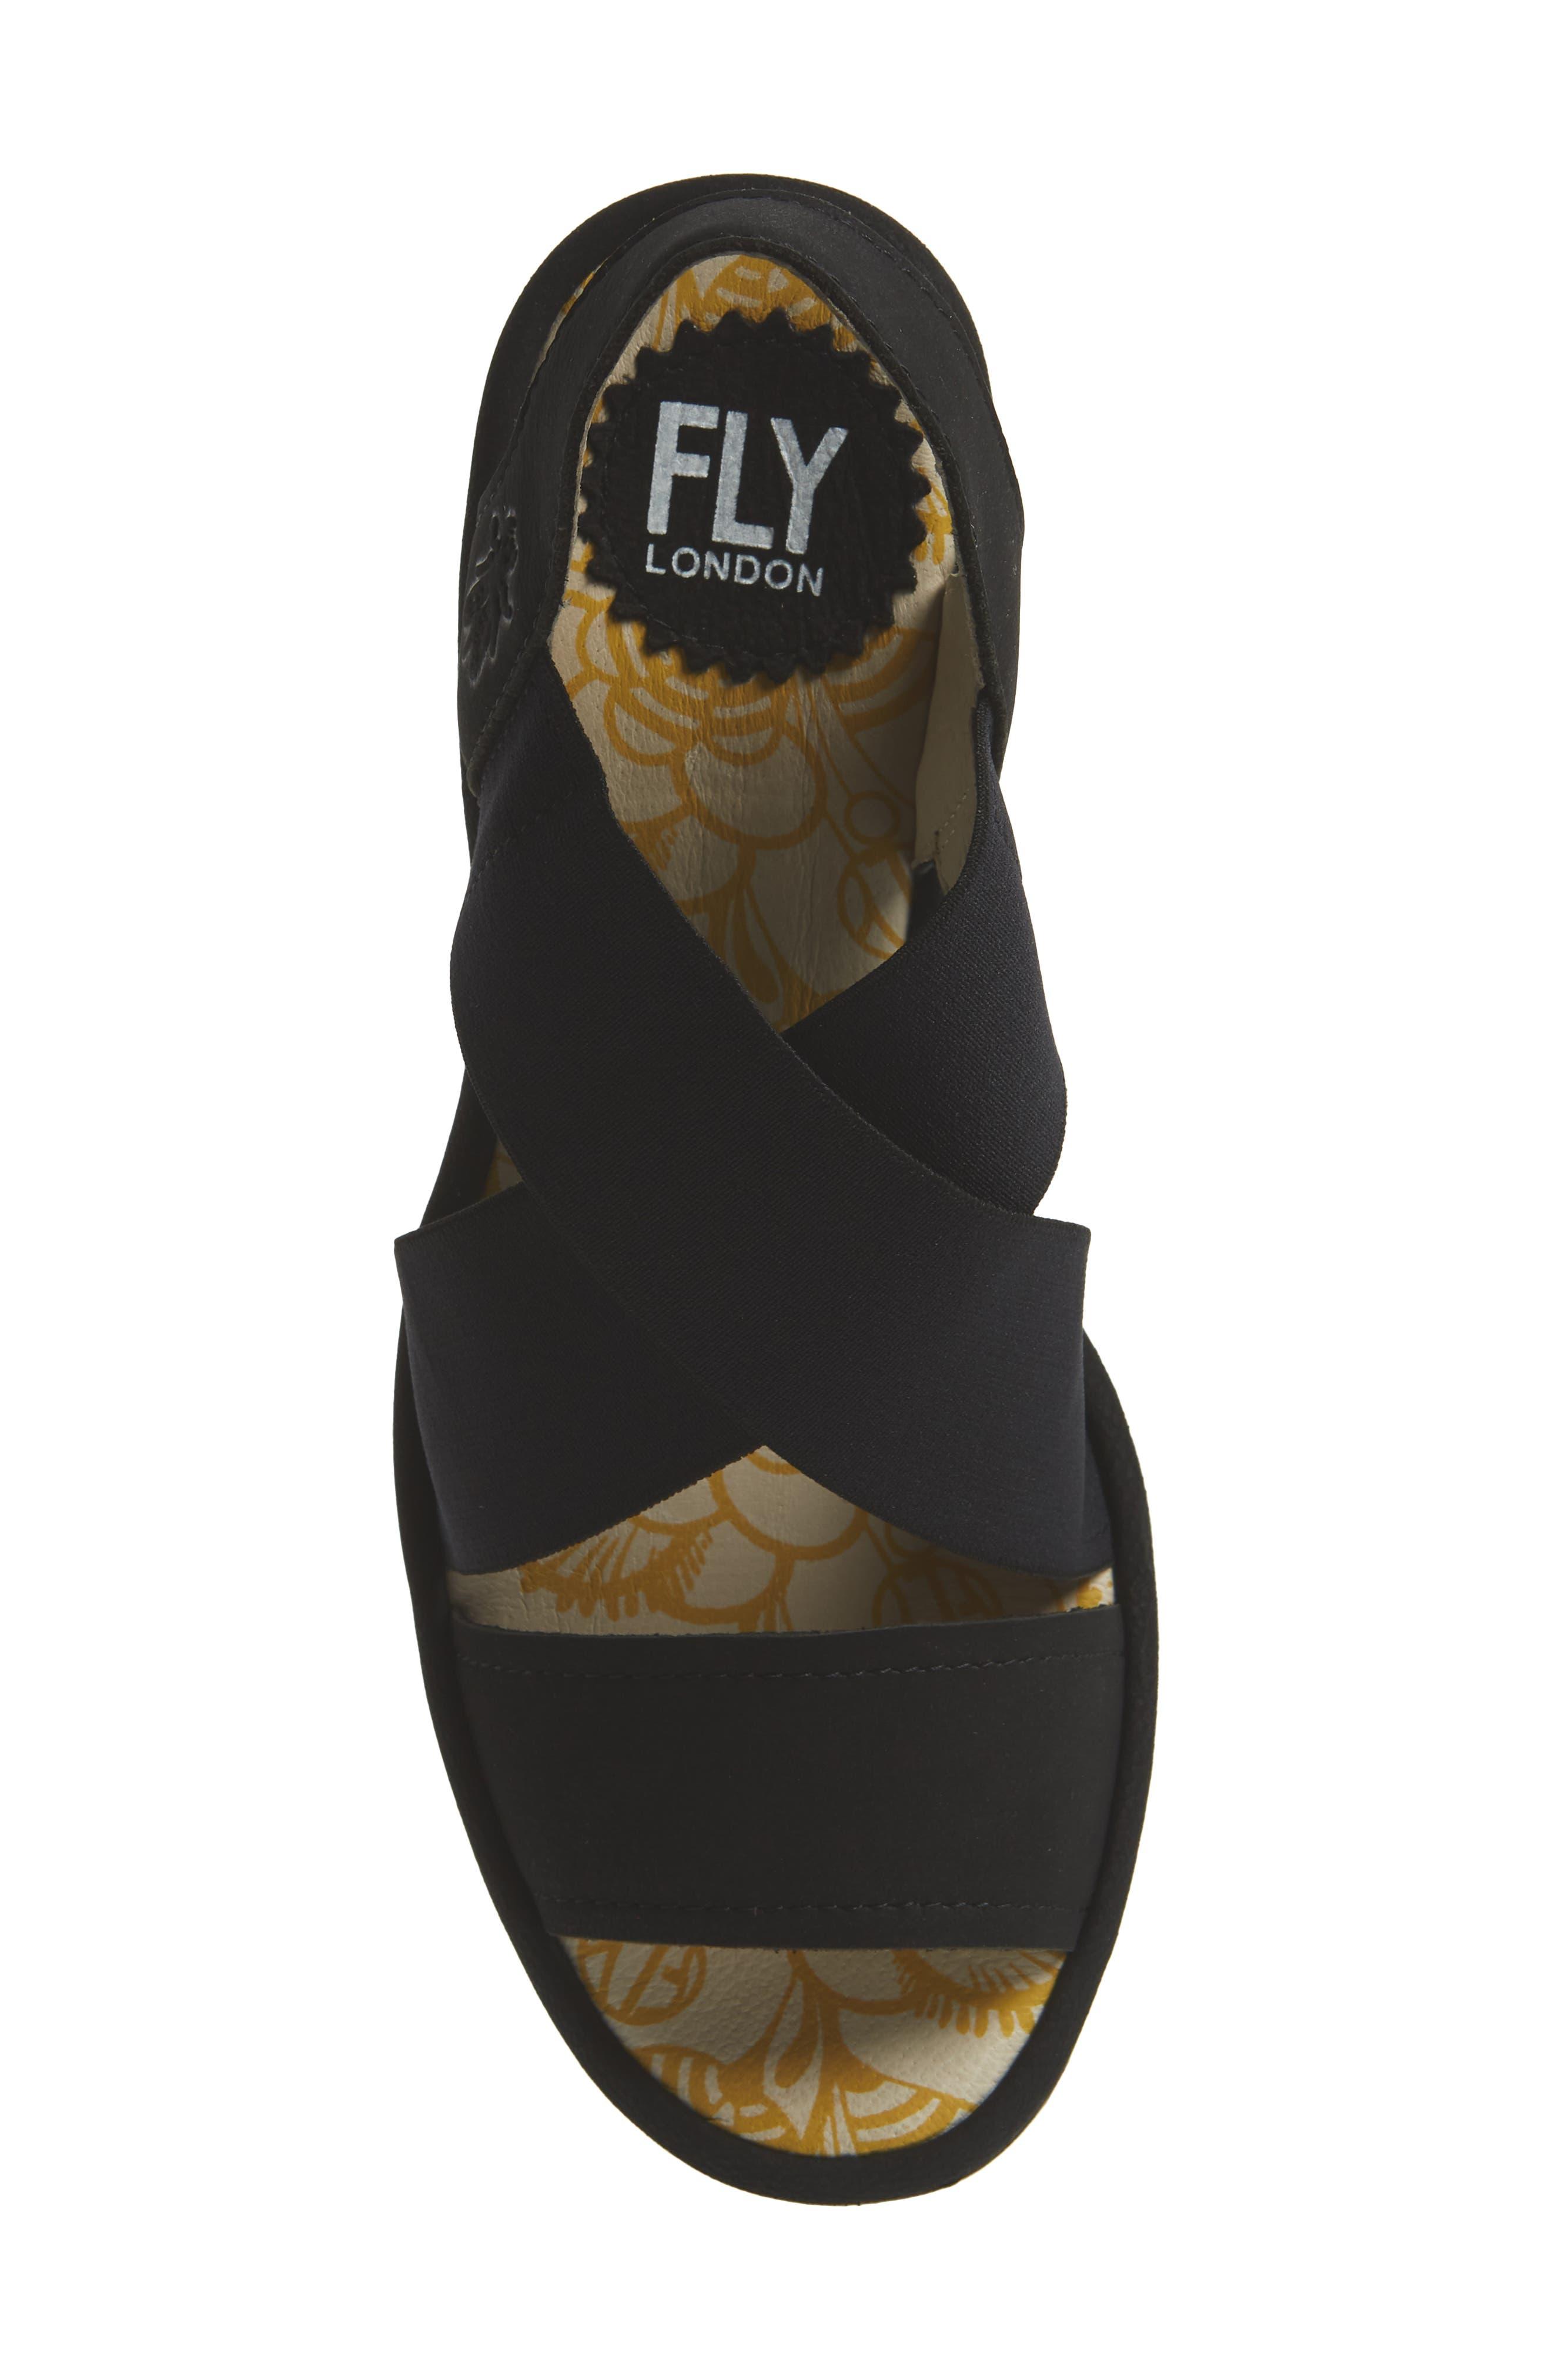 FLY LONDON, Yaji Cross Wedge Sandal, Alternate thumbnail 5, color, BLACK LEATHER